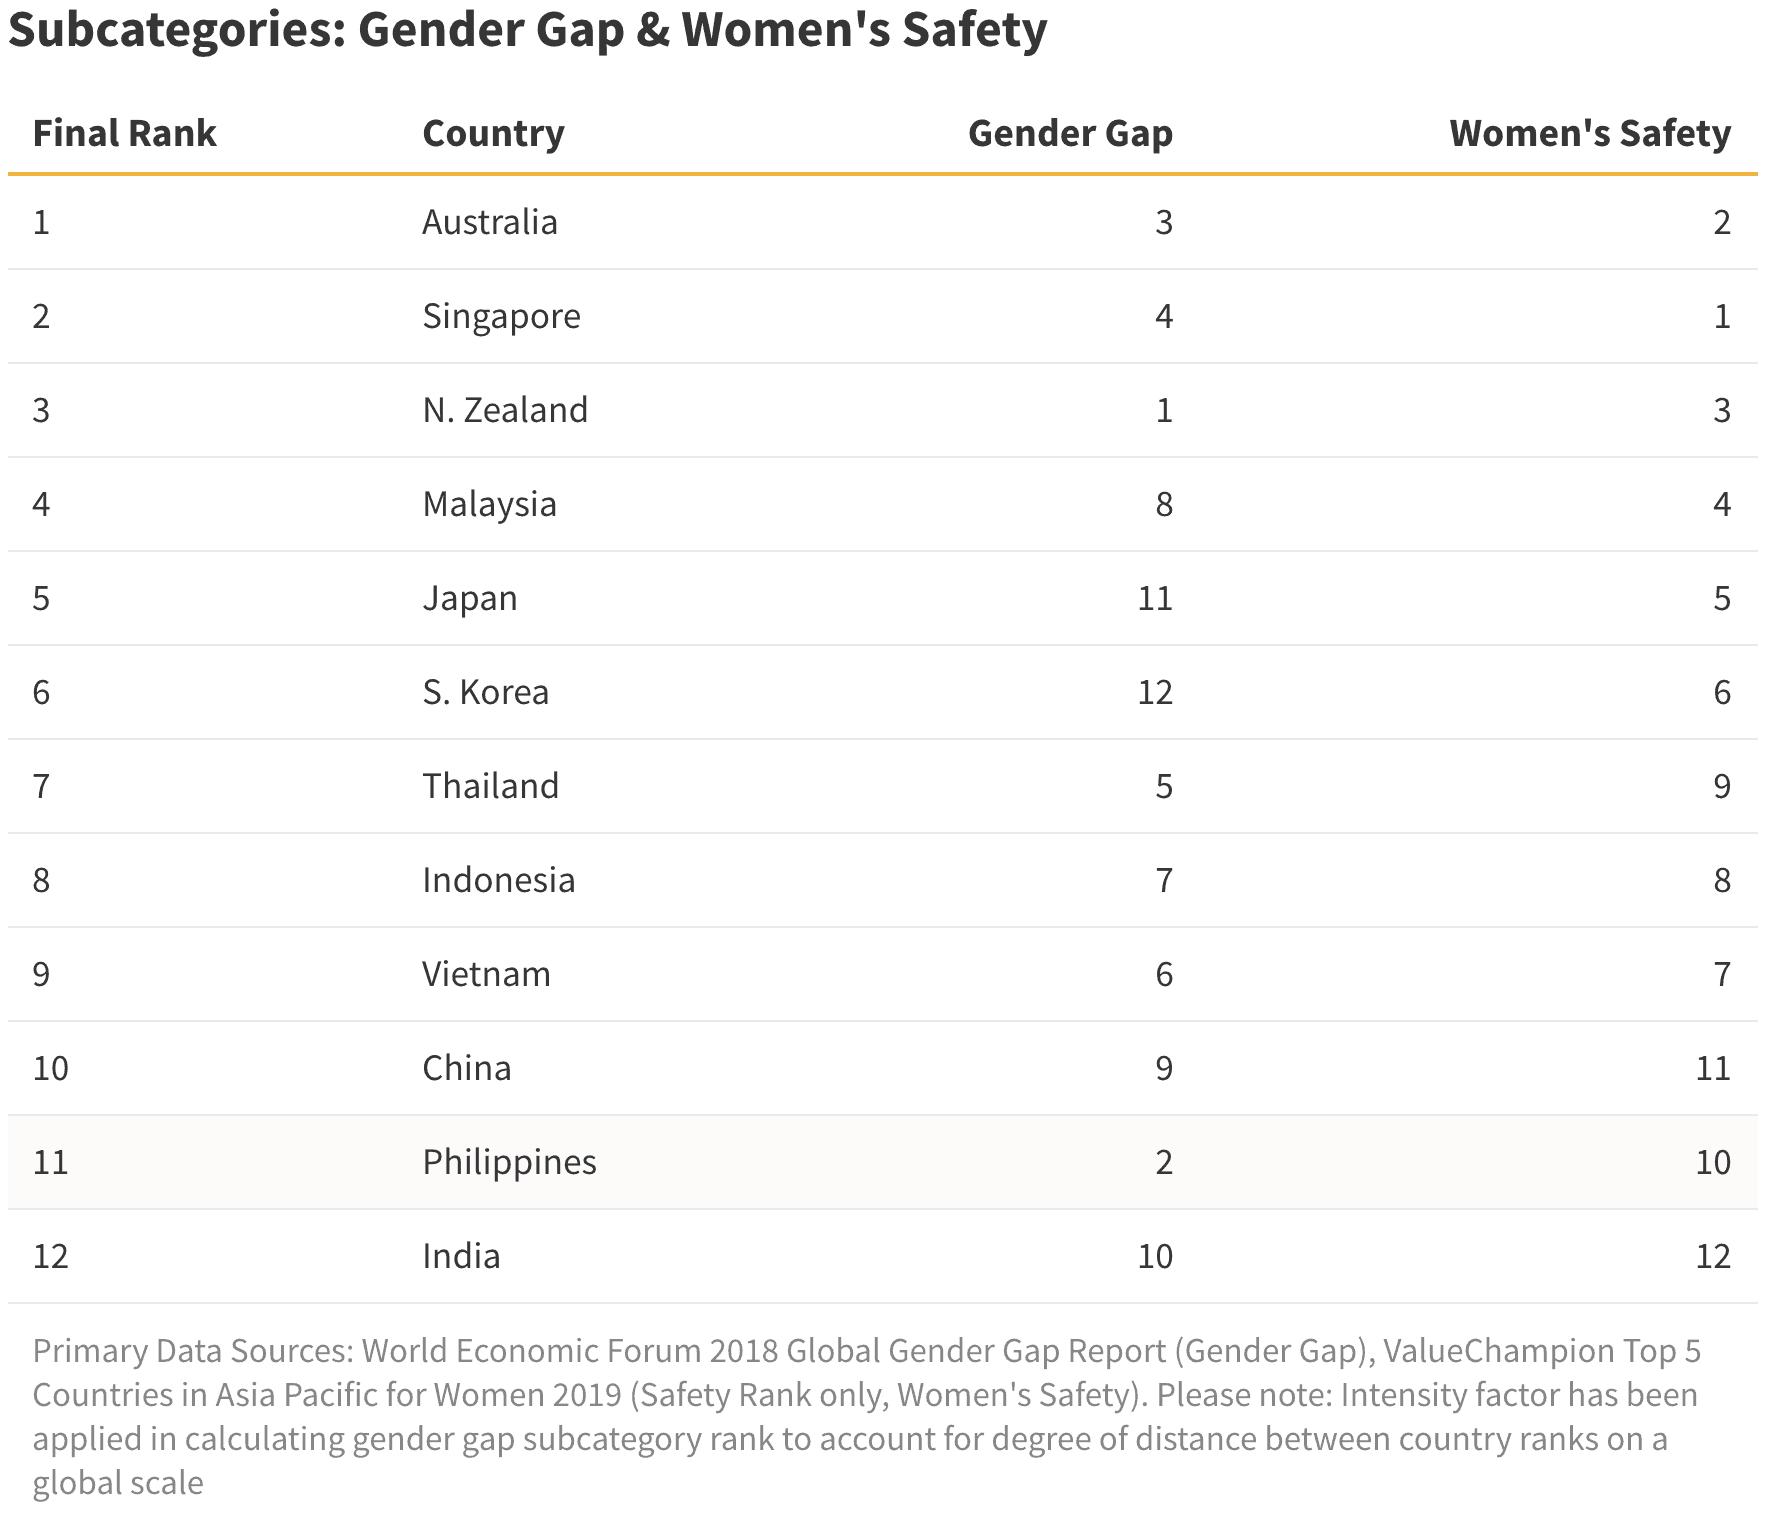 ValueChampion Subcategories Gender Gap & Women's Safety